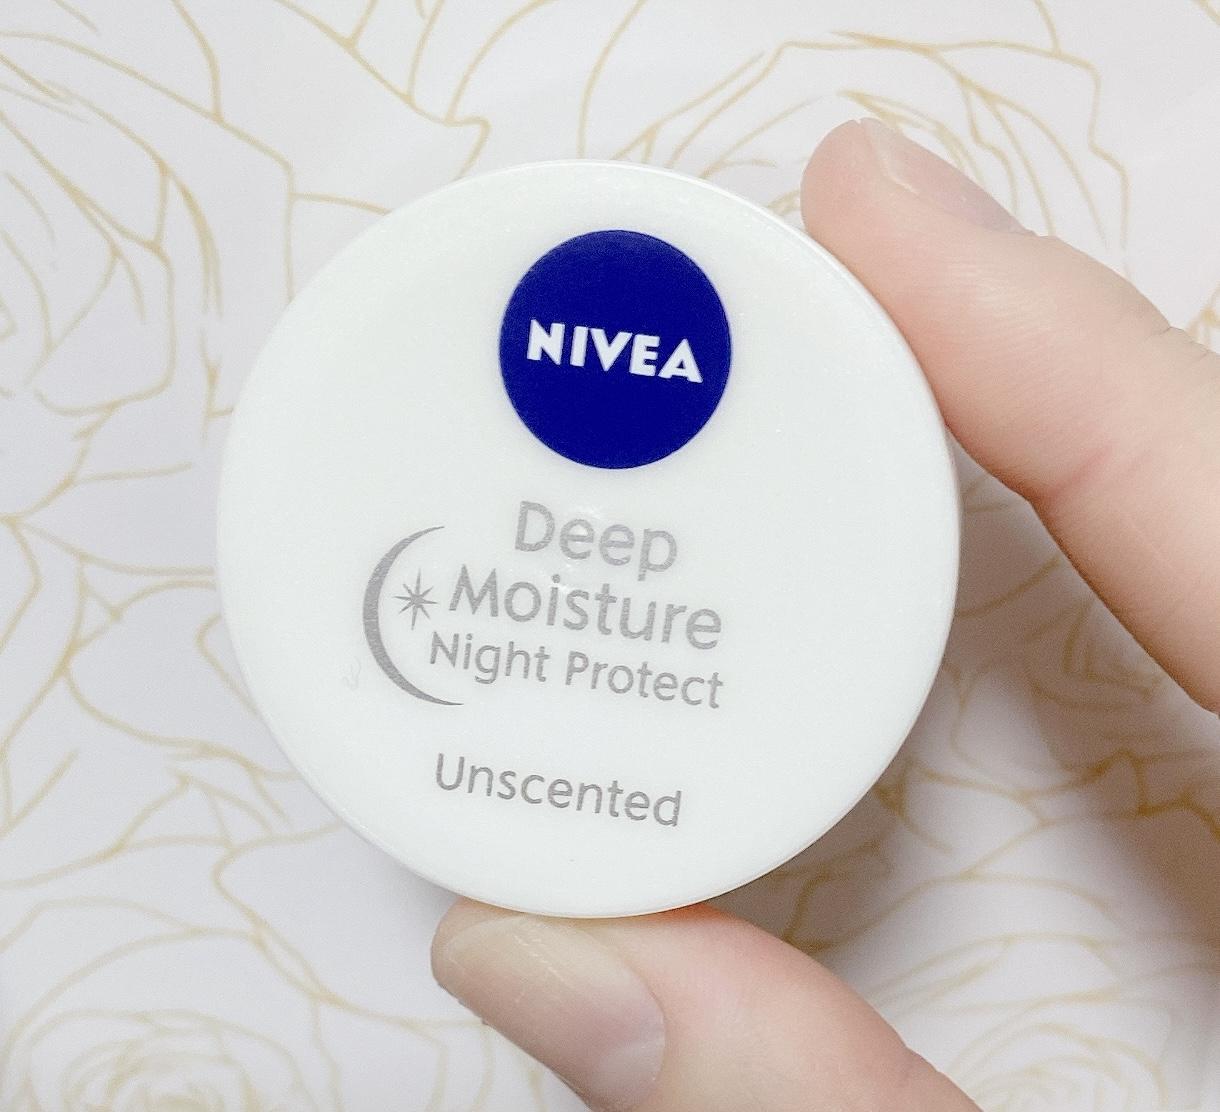 NIVEA(ニベア)ディープモイスチャー ナイトプロテクトを使った mocha*さんのクチコミ画像